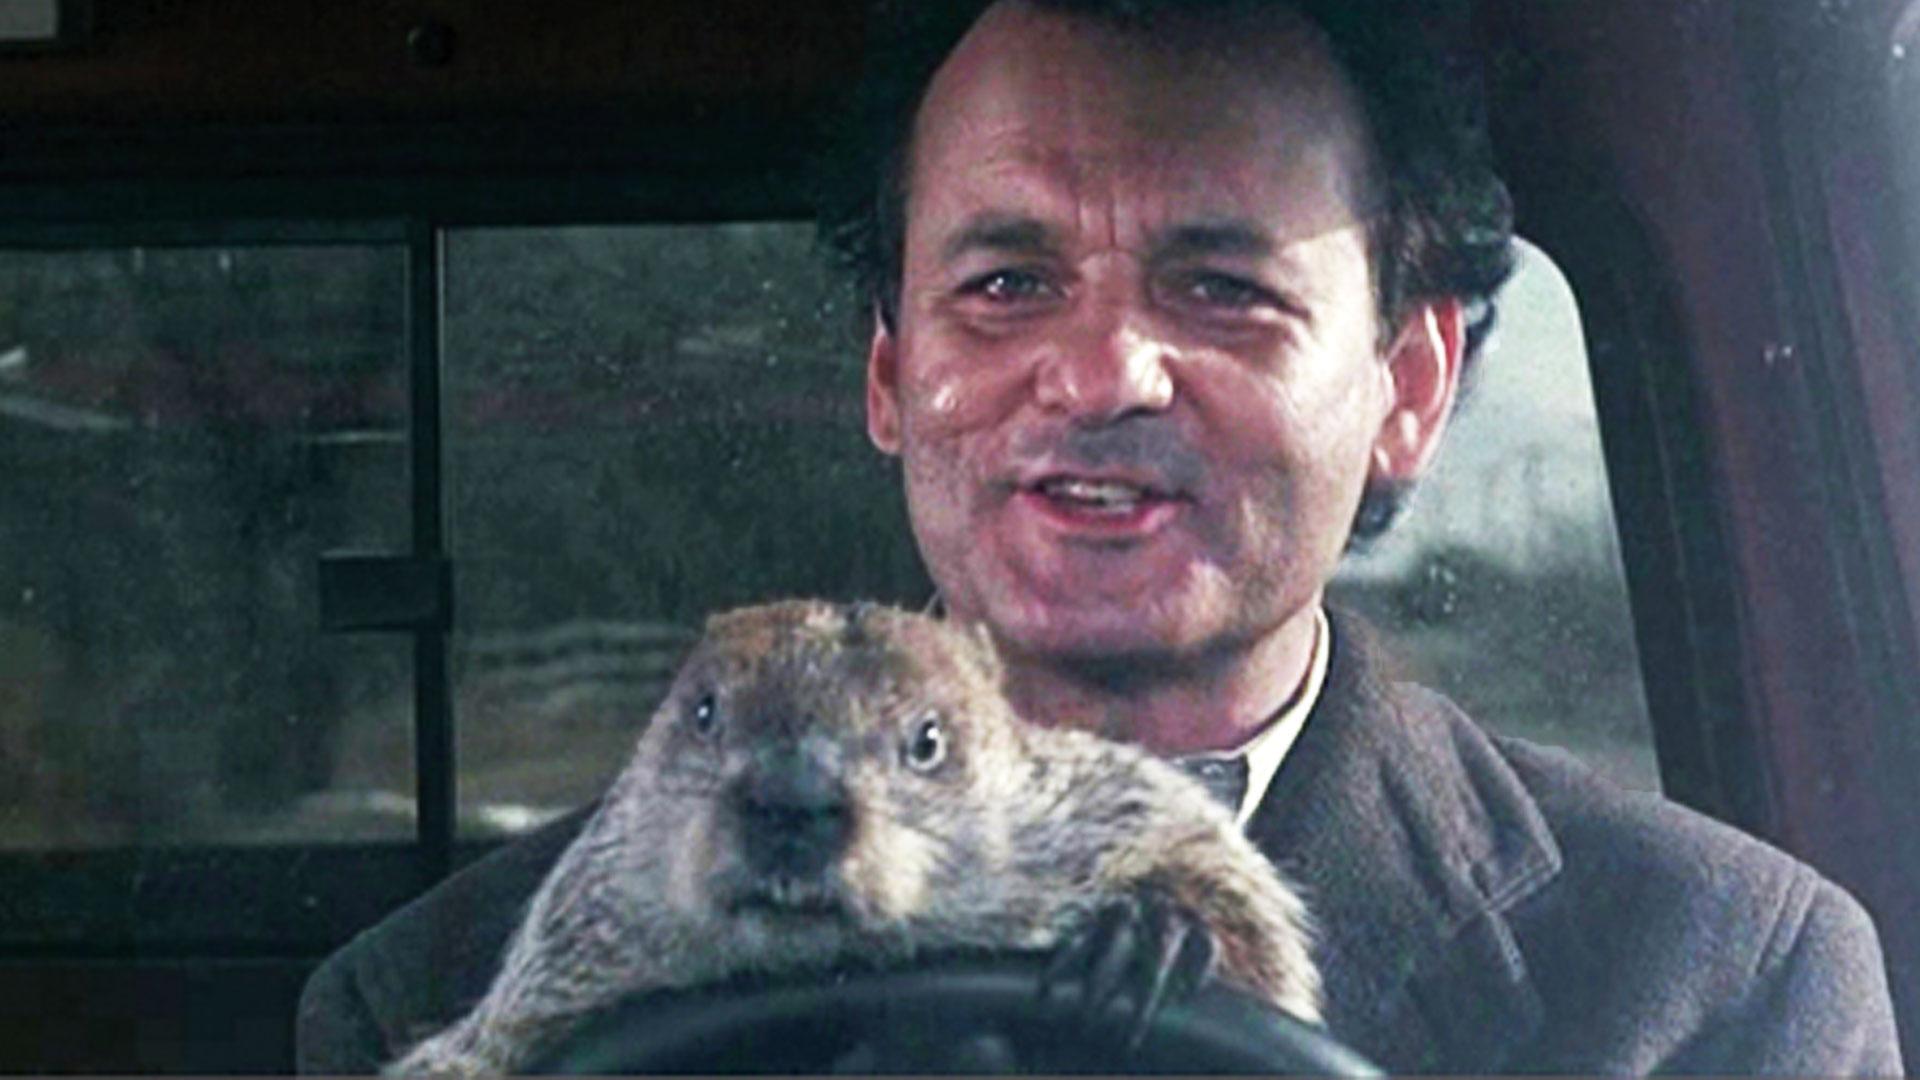 39. Groundhog Day